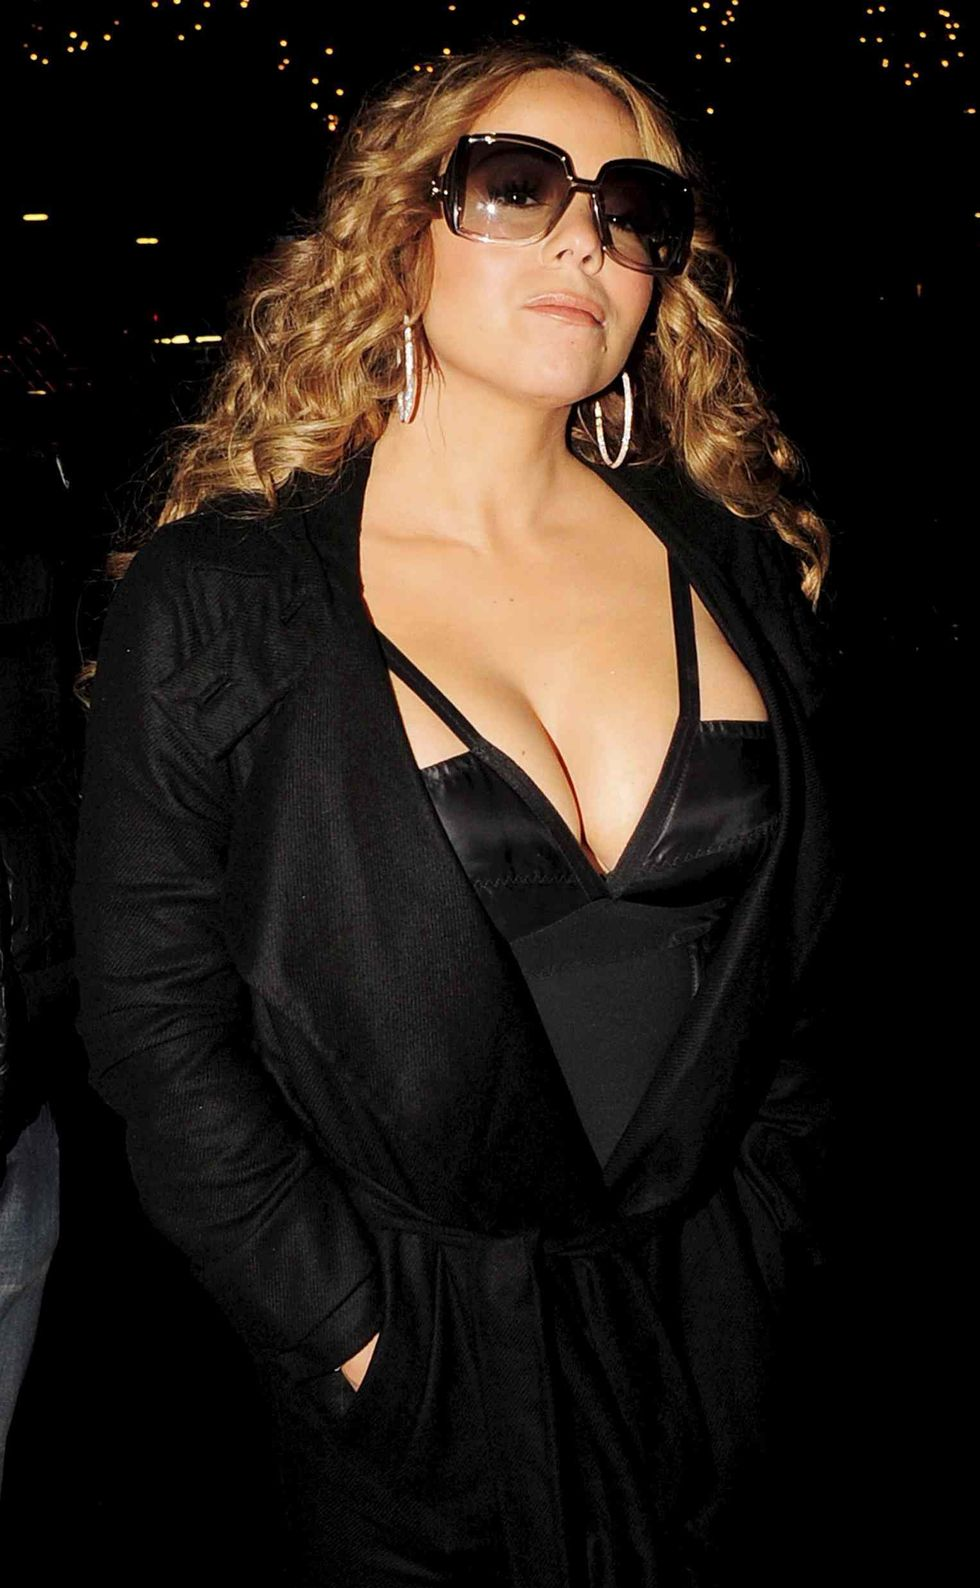 mariah-carey-cleavage-candids-in-london-06